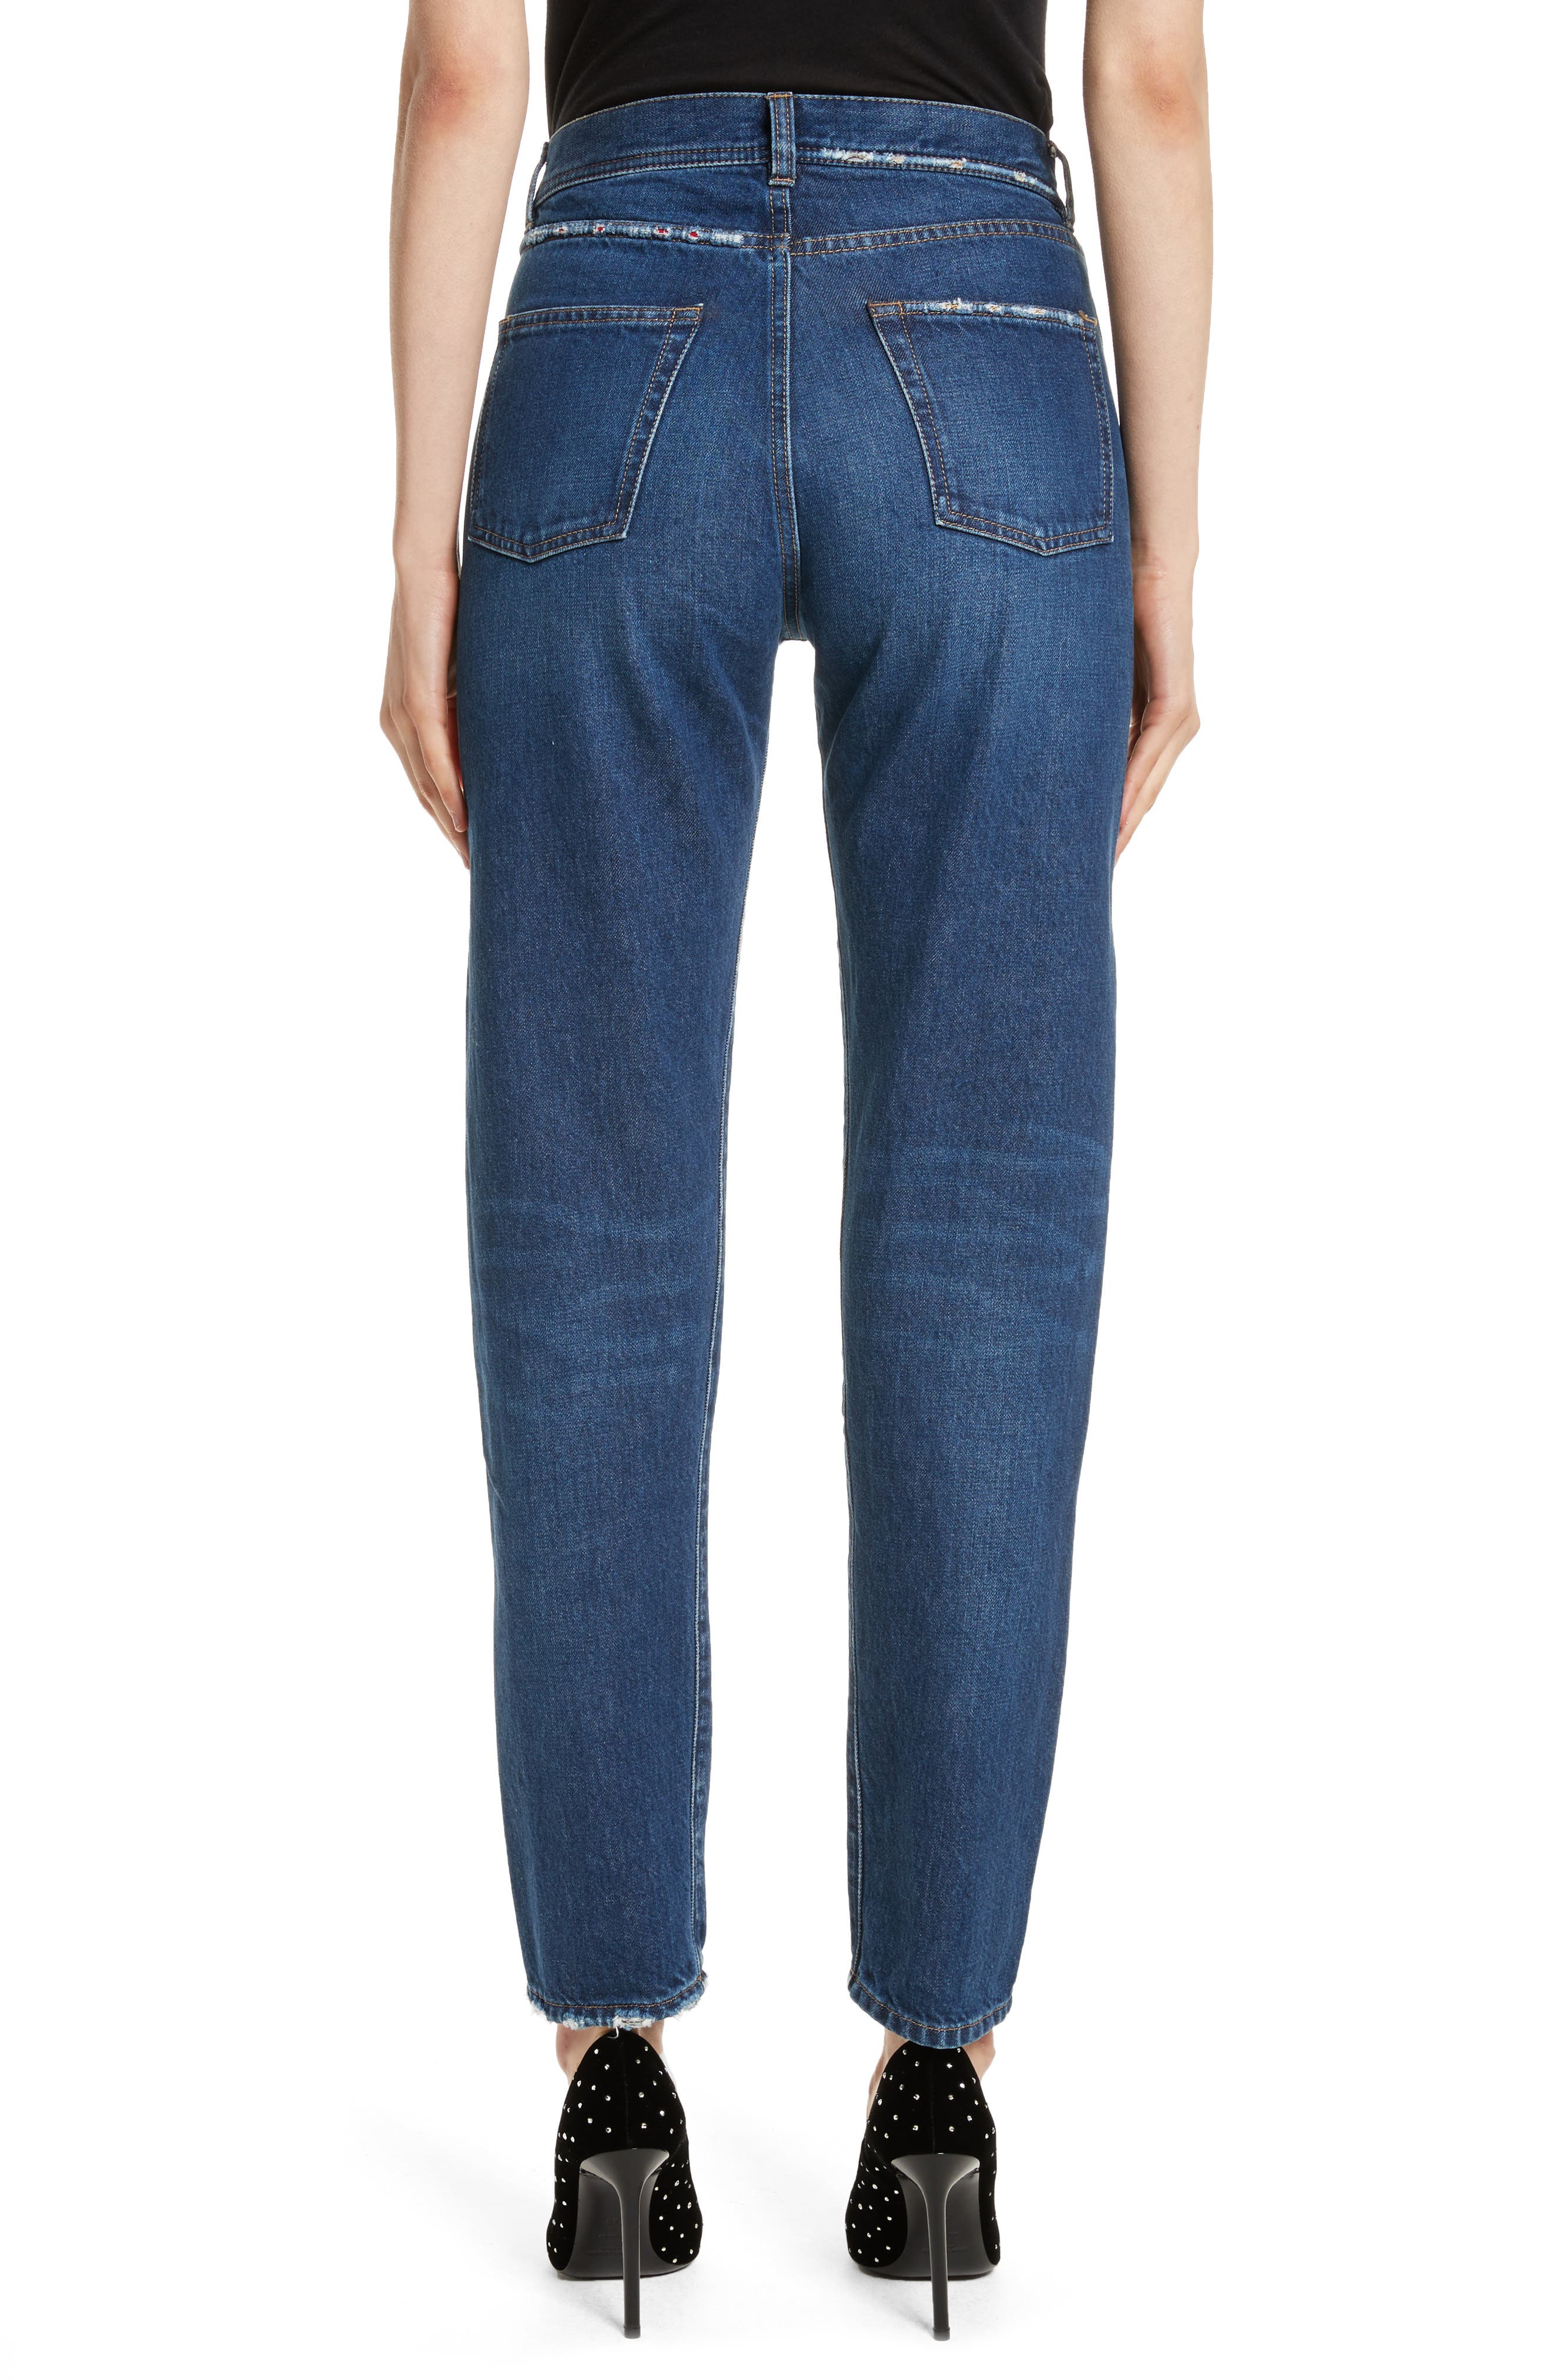 Alternate Image 2  - Saint Laurent Embroidered Jeans (Deep Dark Blue)